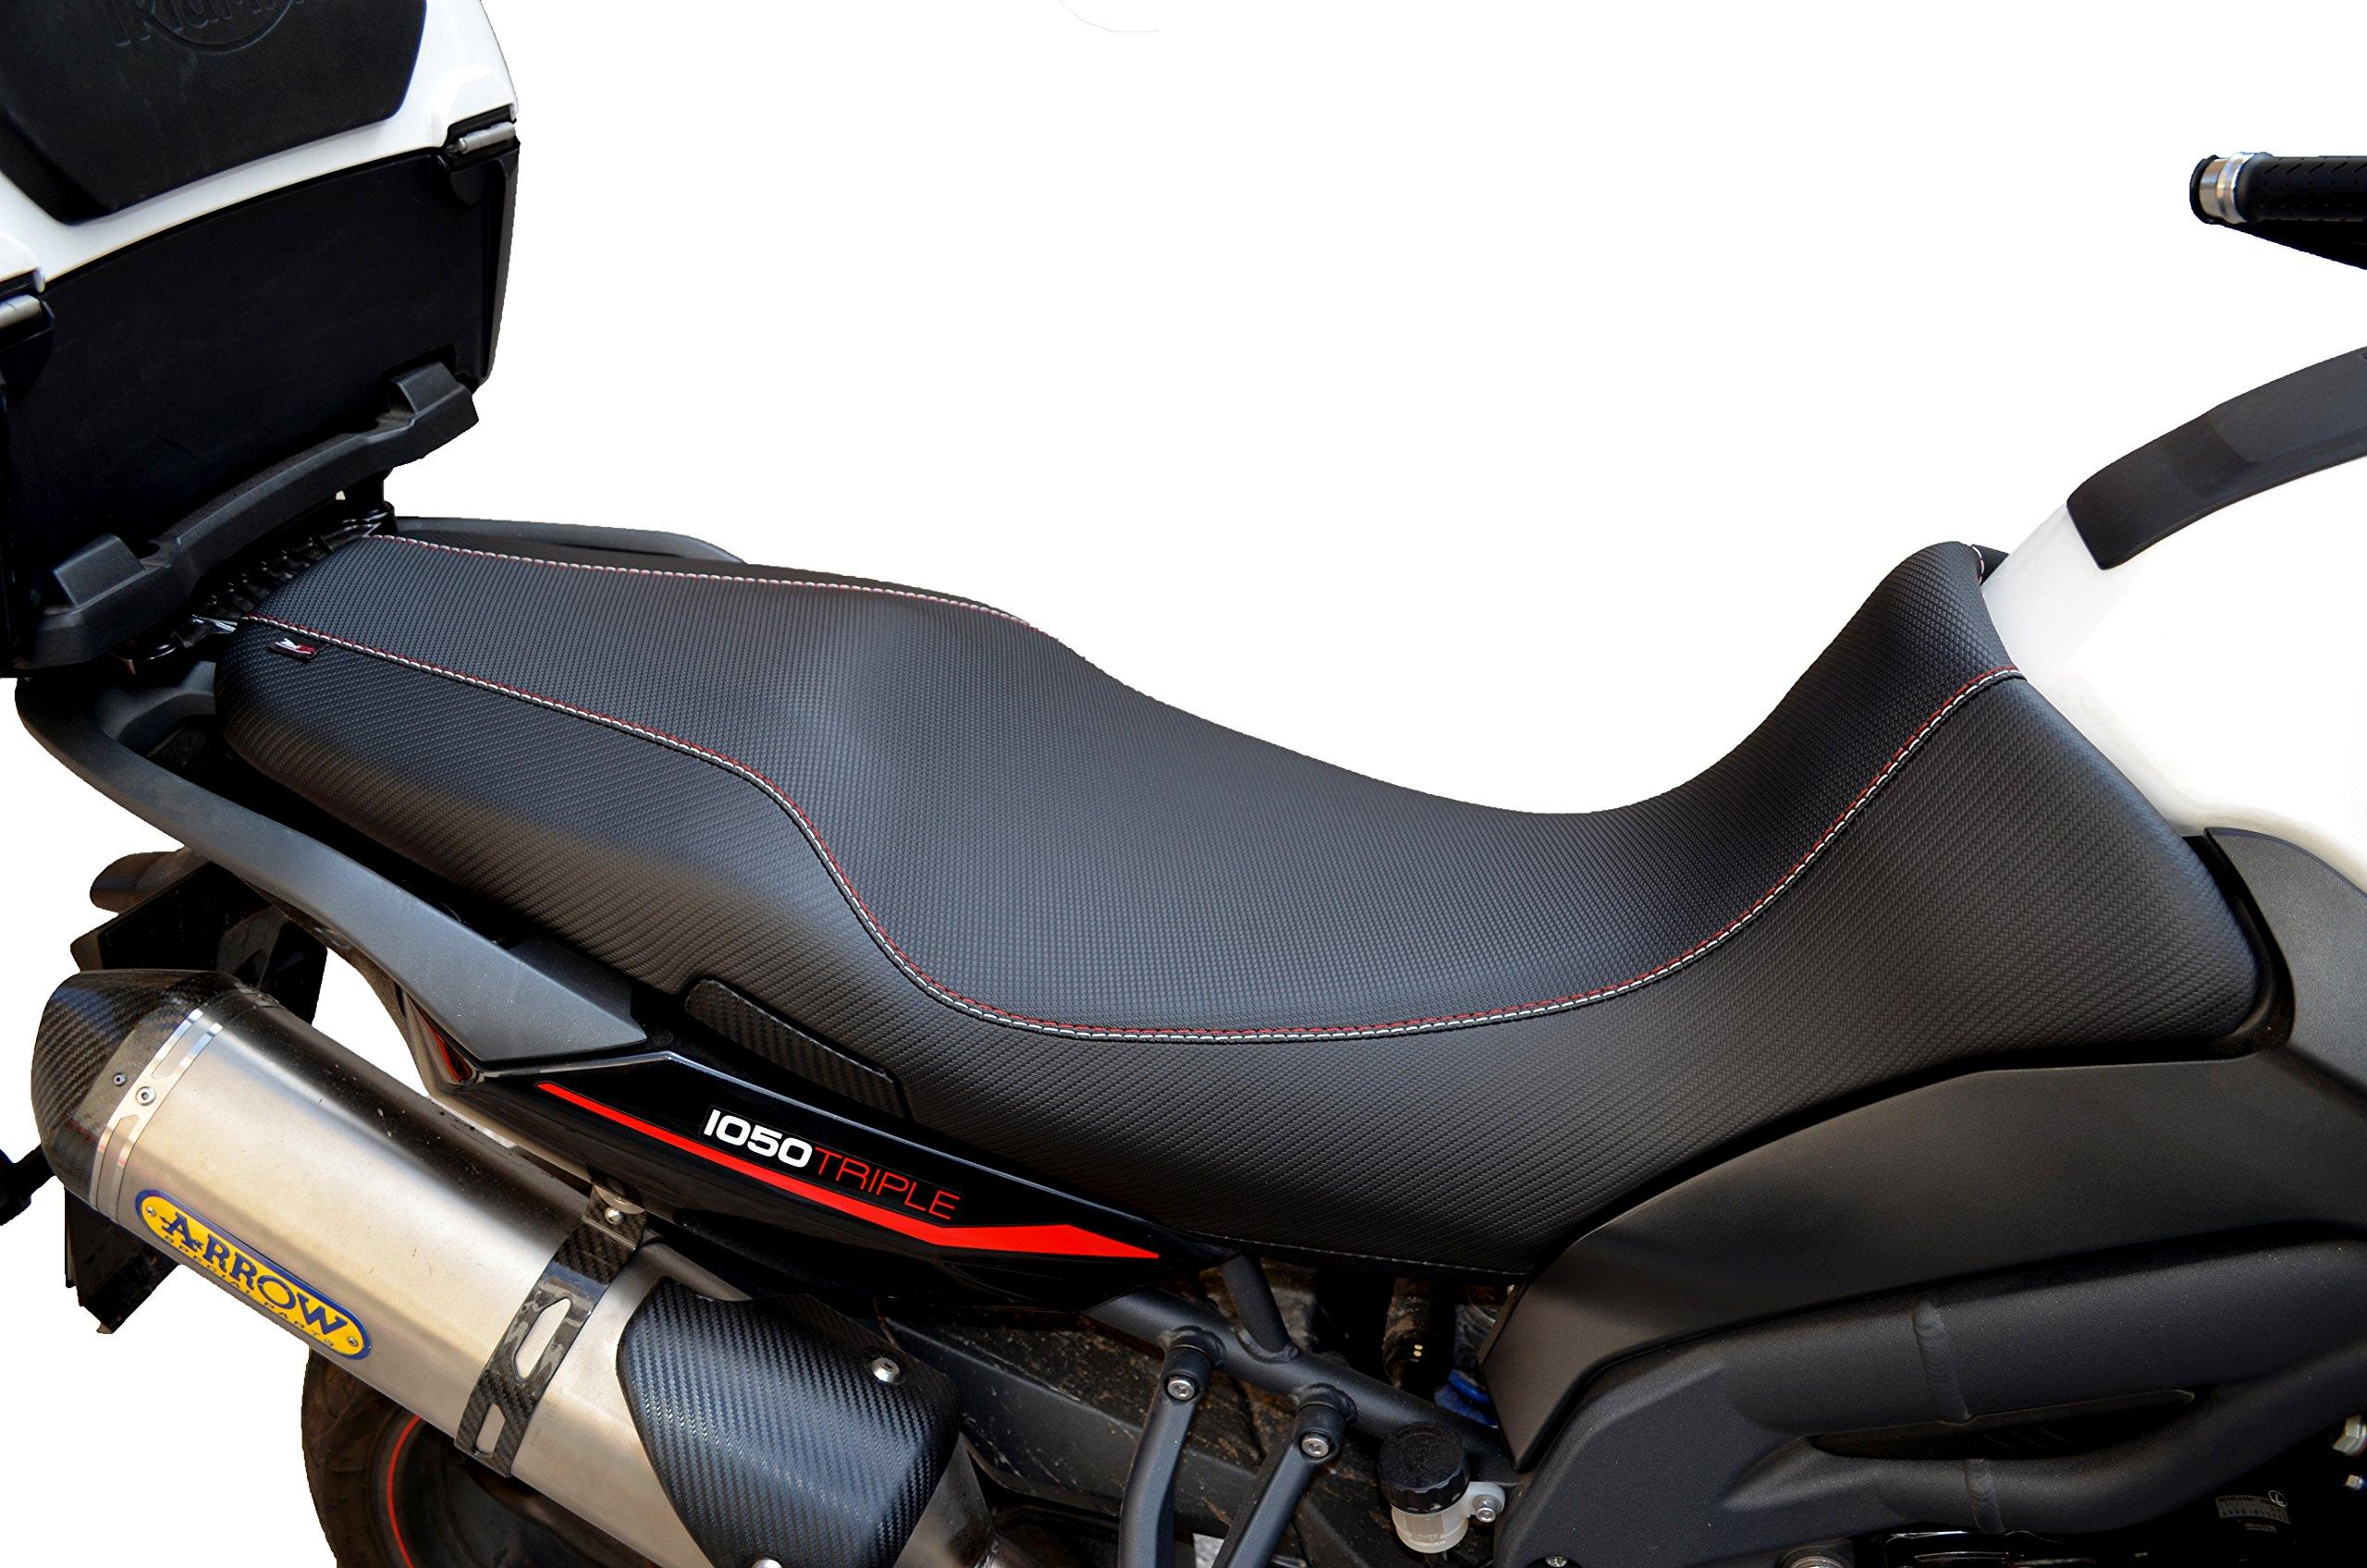 Triumph Tiger 1050 Sport 2014-2016 MotoK Seat Cover Anti-Slip Customize It B499